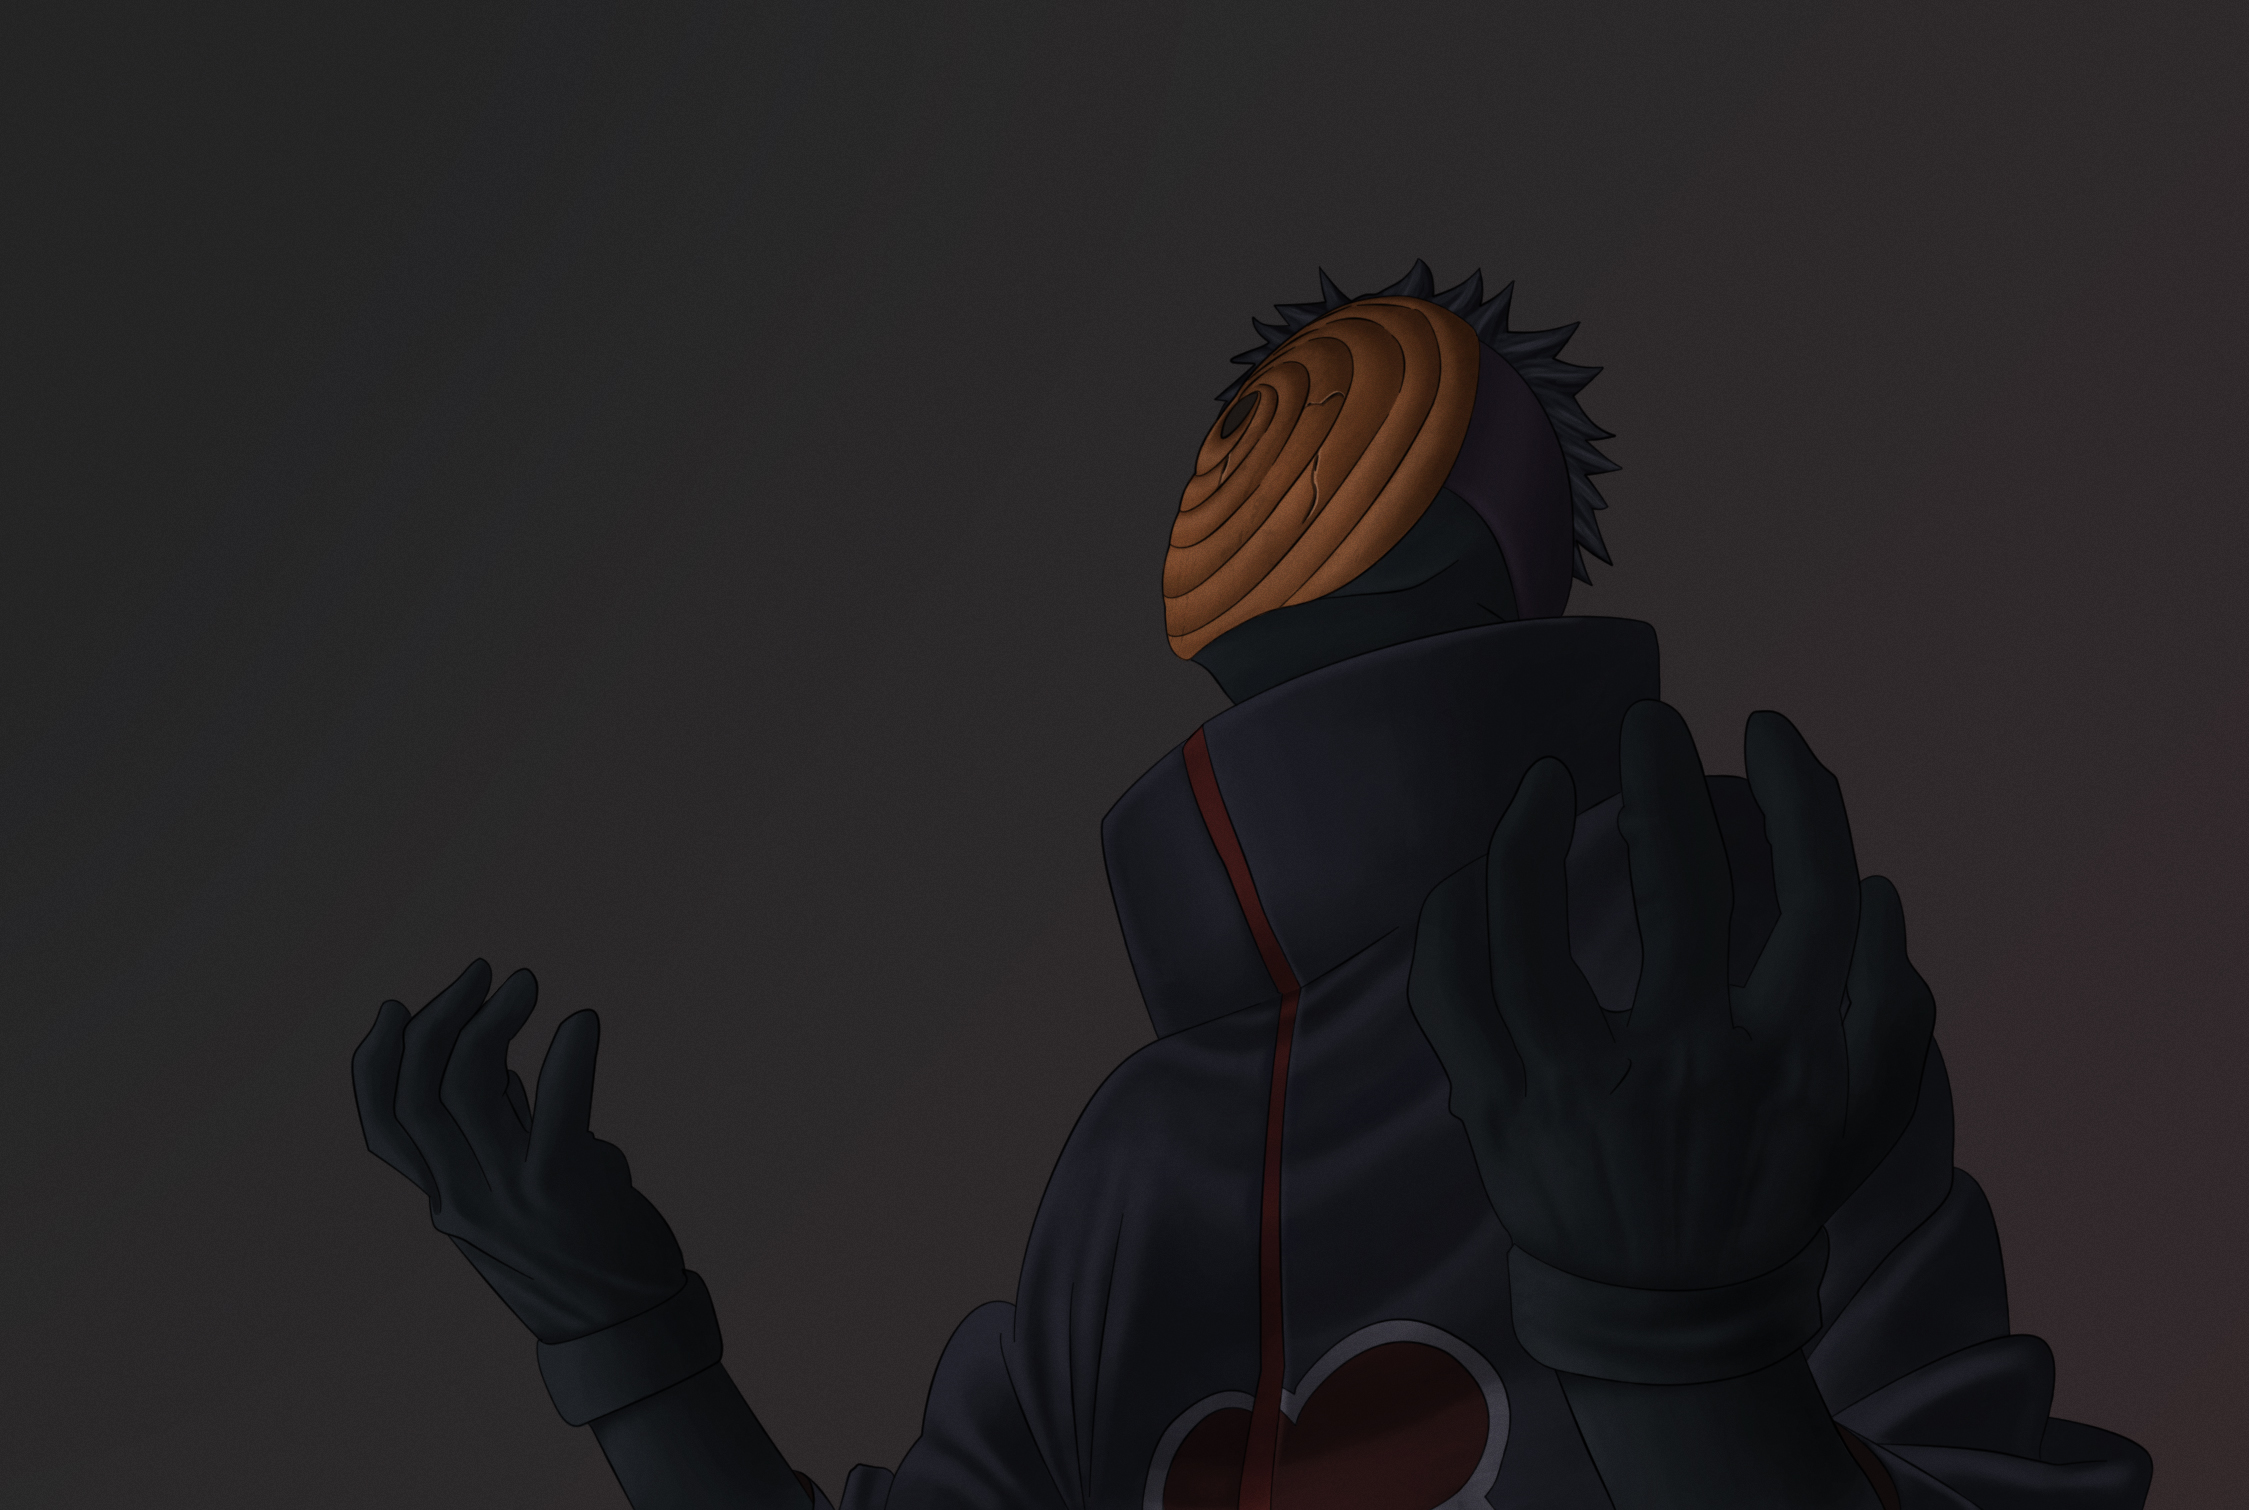 mask wallpaper hd